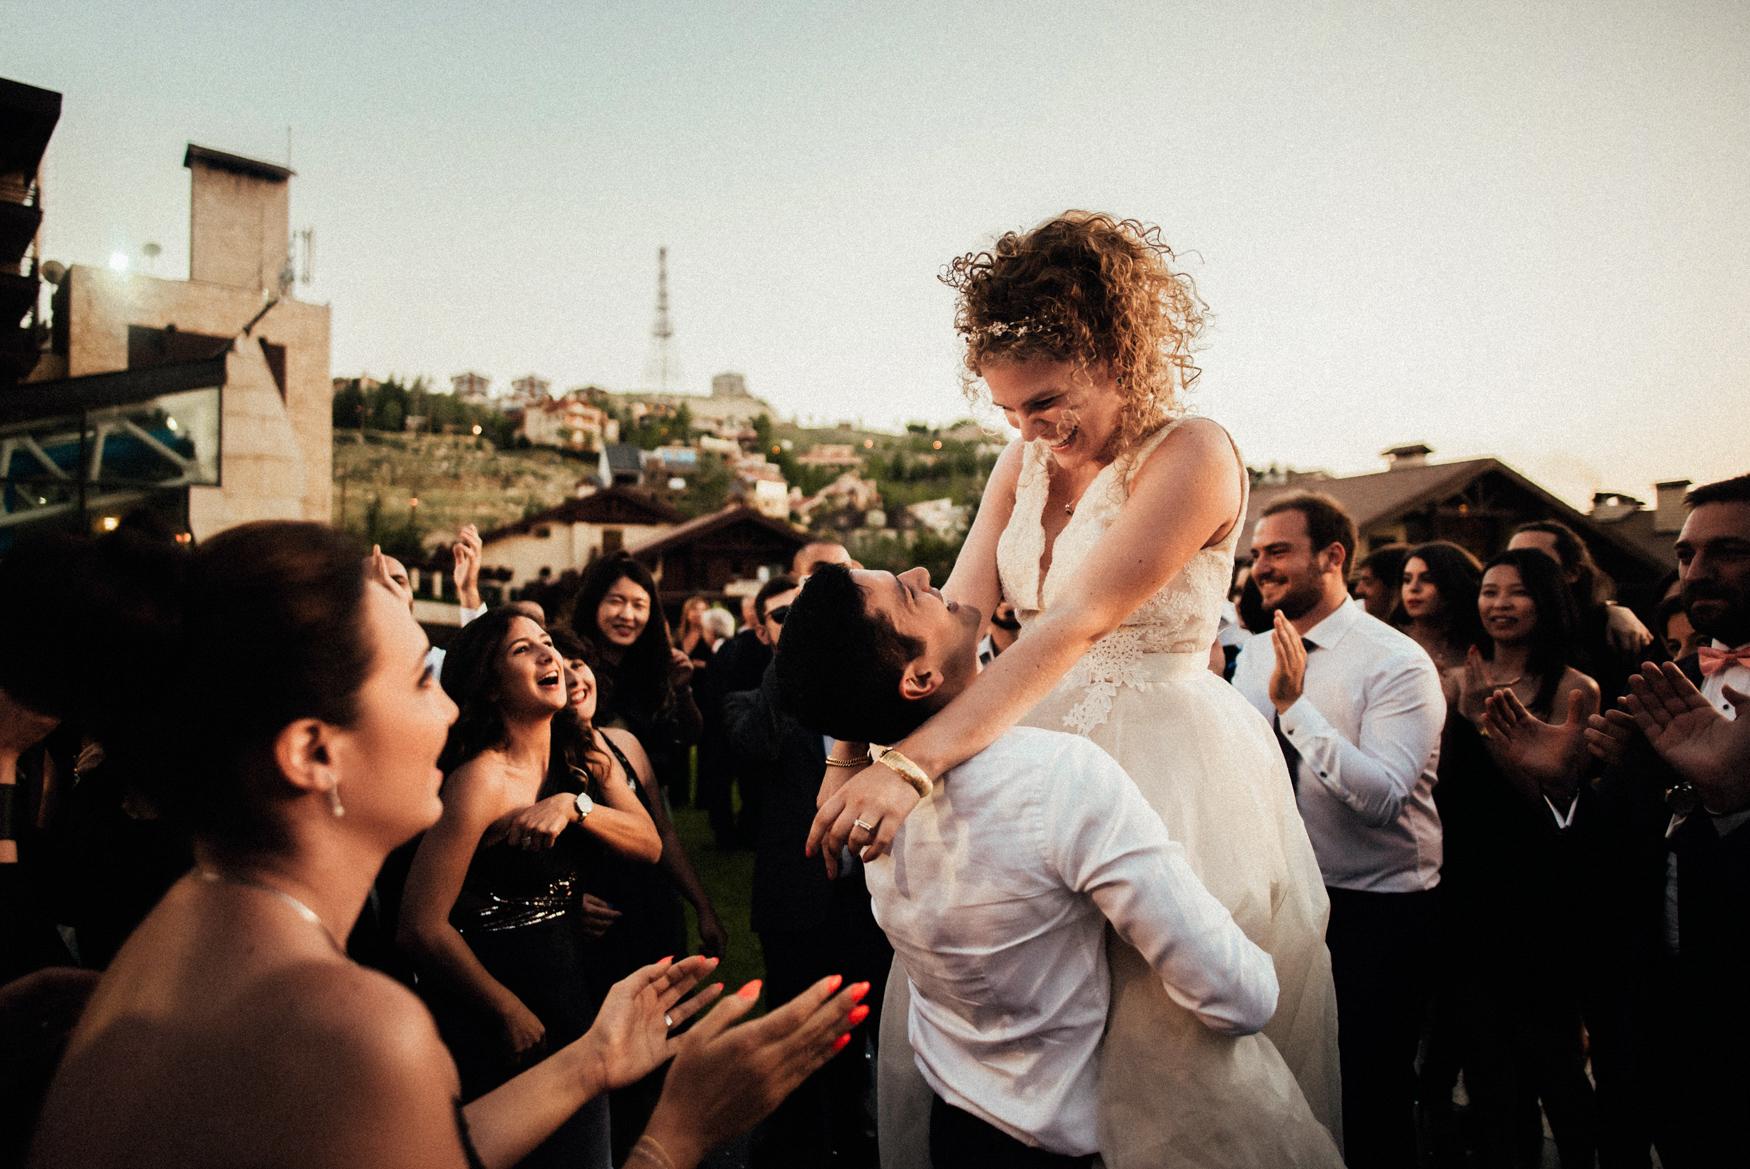 LR5 beirut lebanon mzaar intercontinental wedding photographer 027.jpg